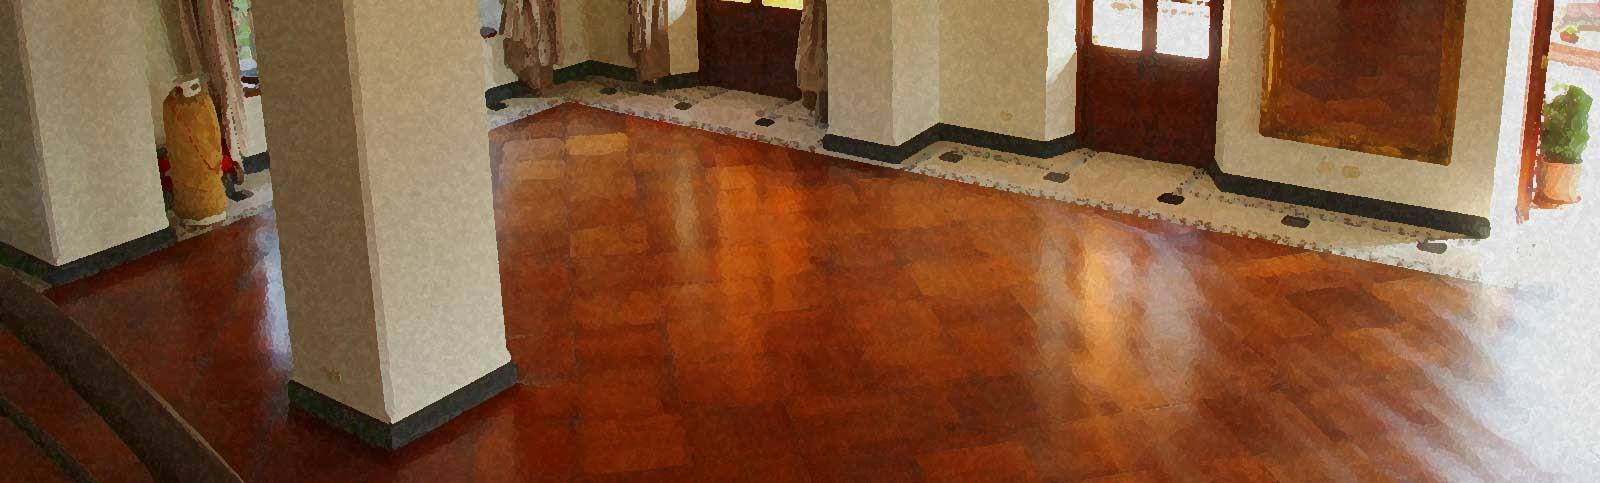 Tips For Choosing Hardwood Flooring Services